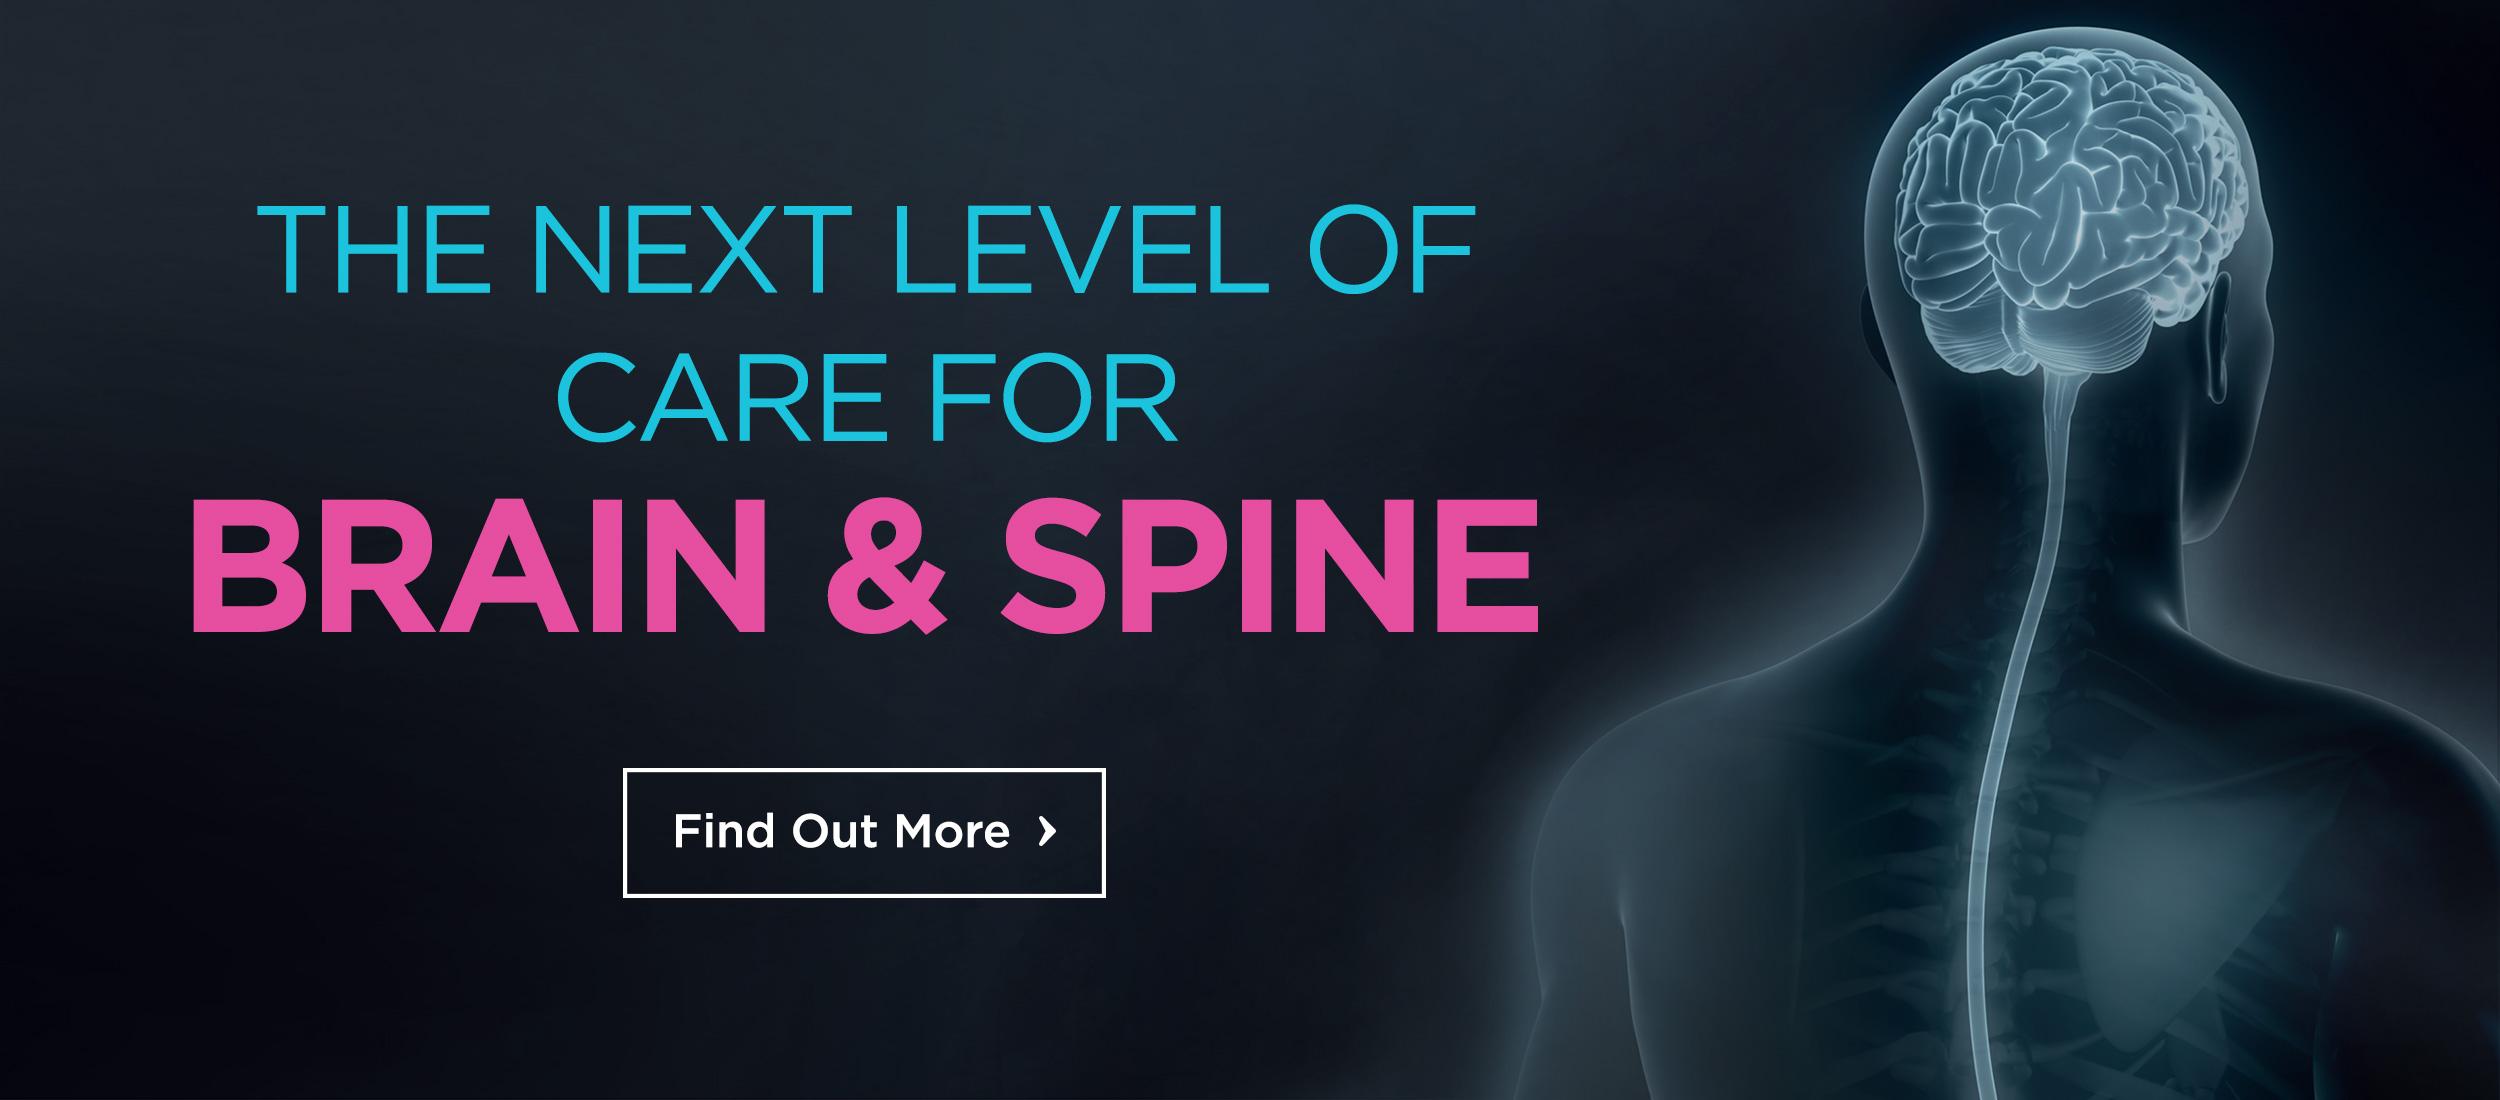 Kokilaben Dhirubhai Ambani Hospital - Advances in Brain and Spine